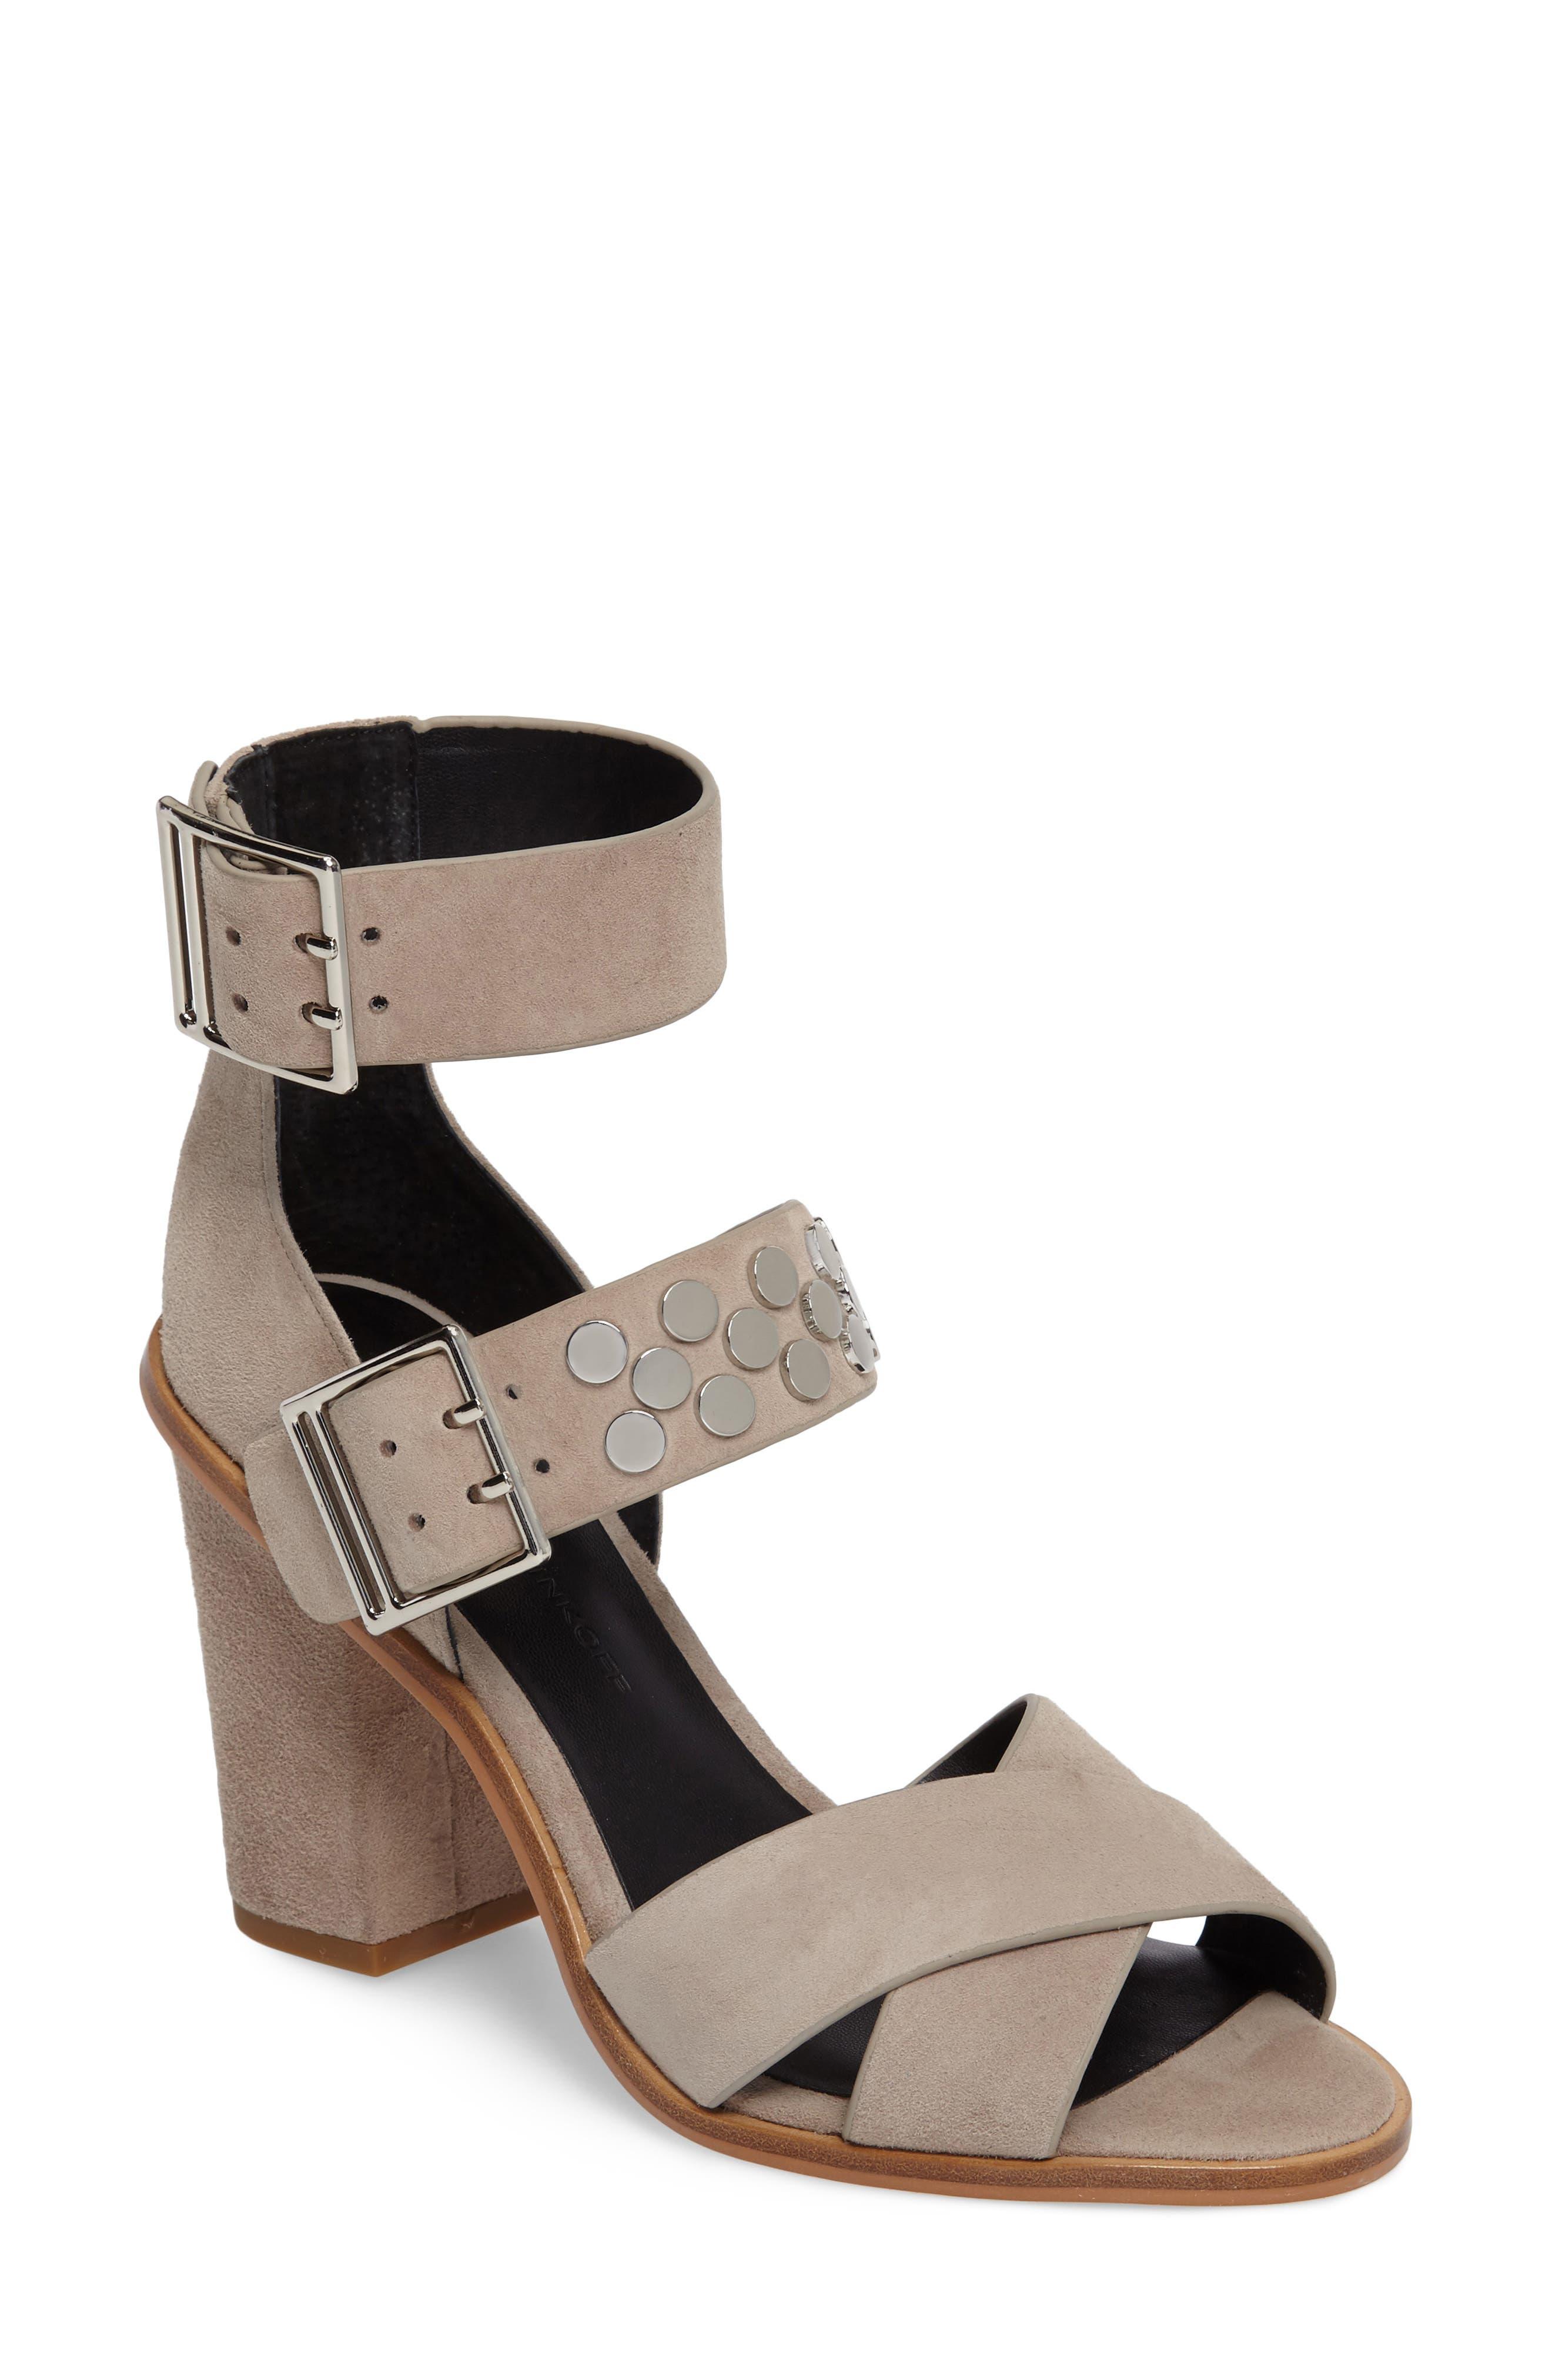 Jennifer Studded Ankle Cuff Sandal,                             Main thumbnail 2, color,